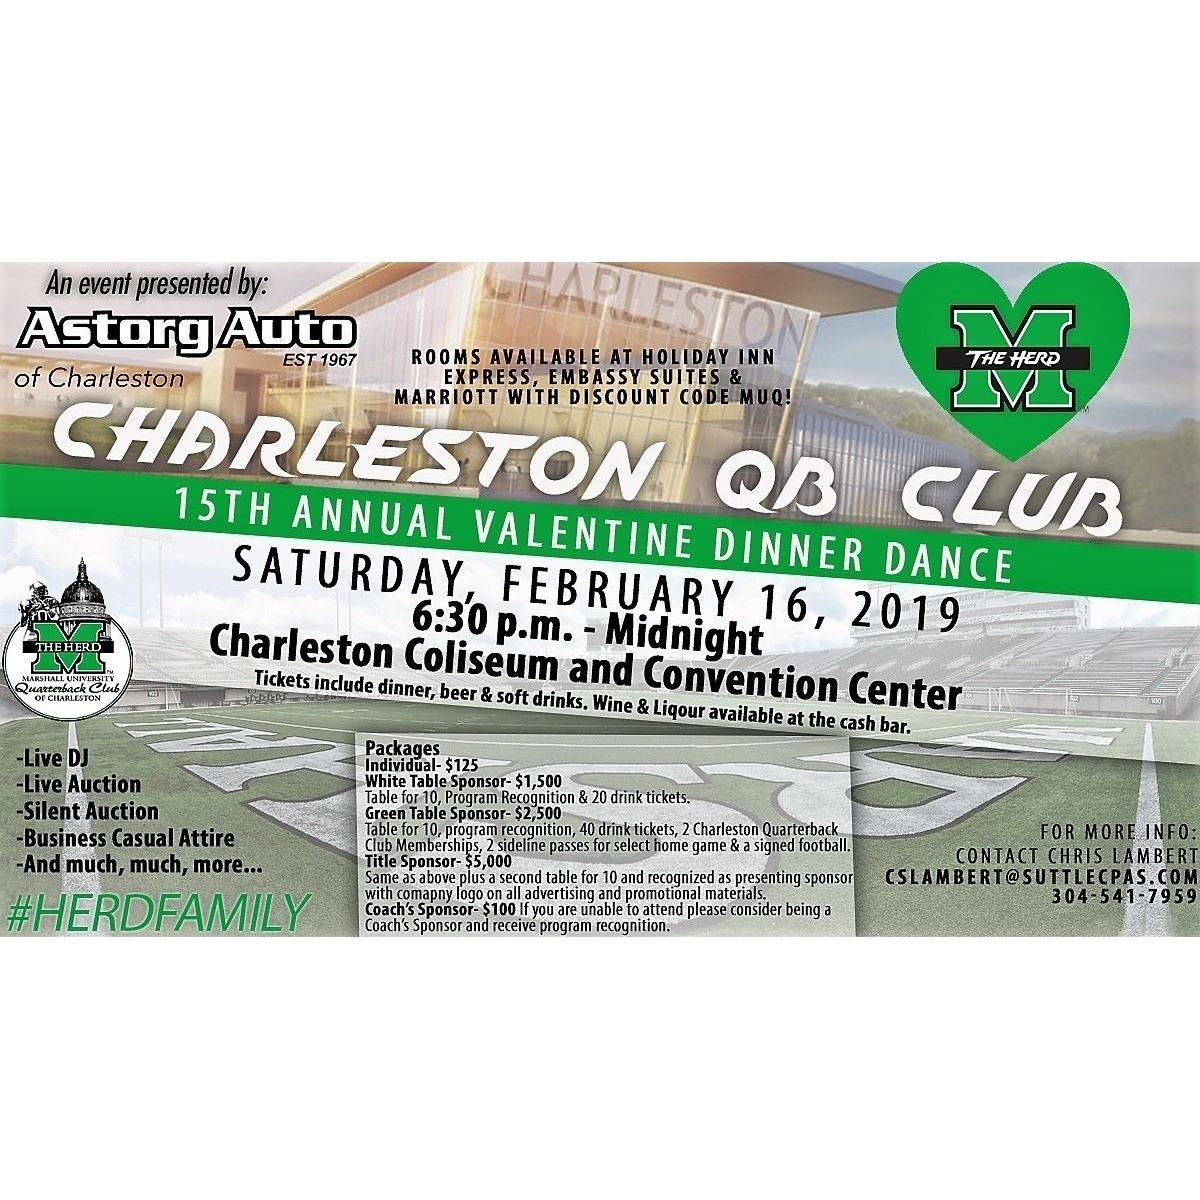 Marshall University Quarterback Club of Charleston Presents: 15th